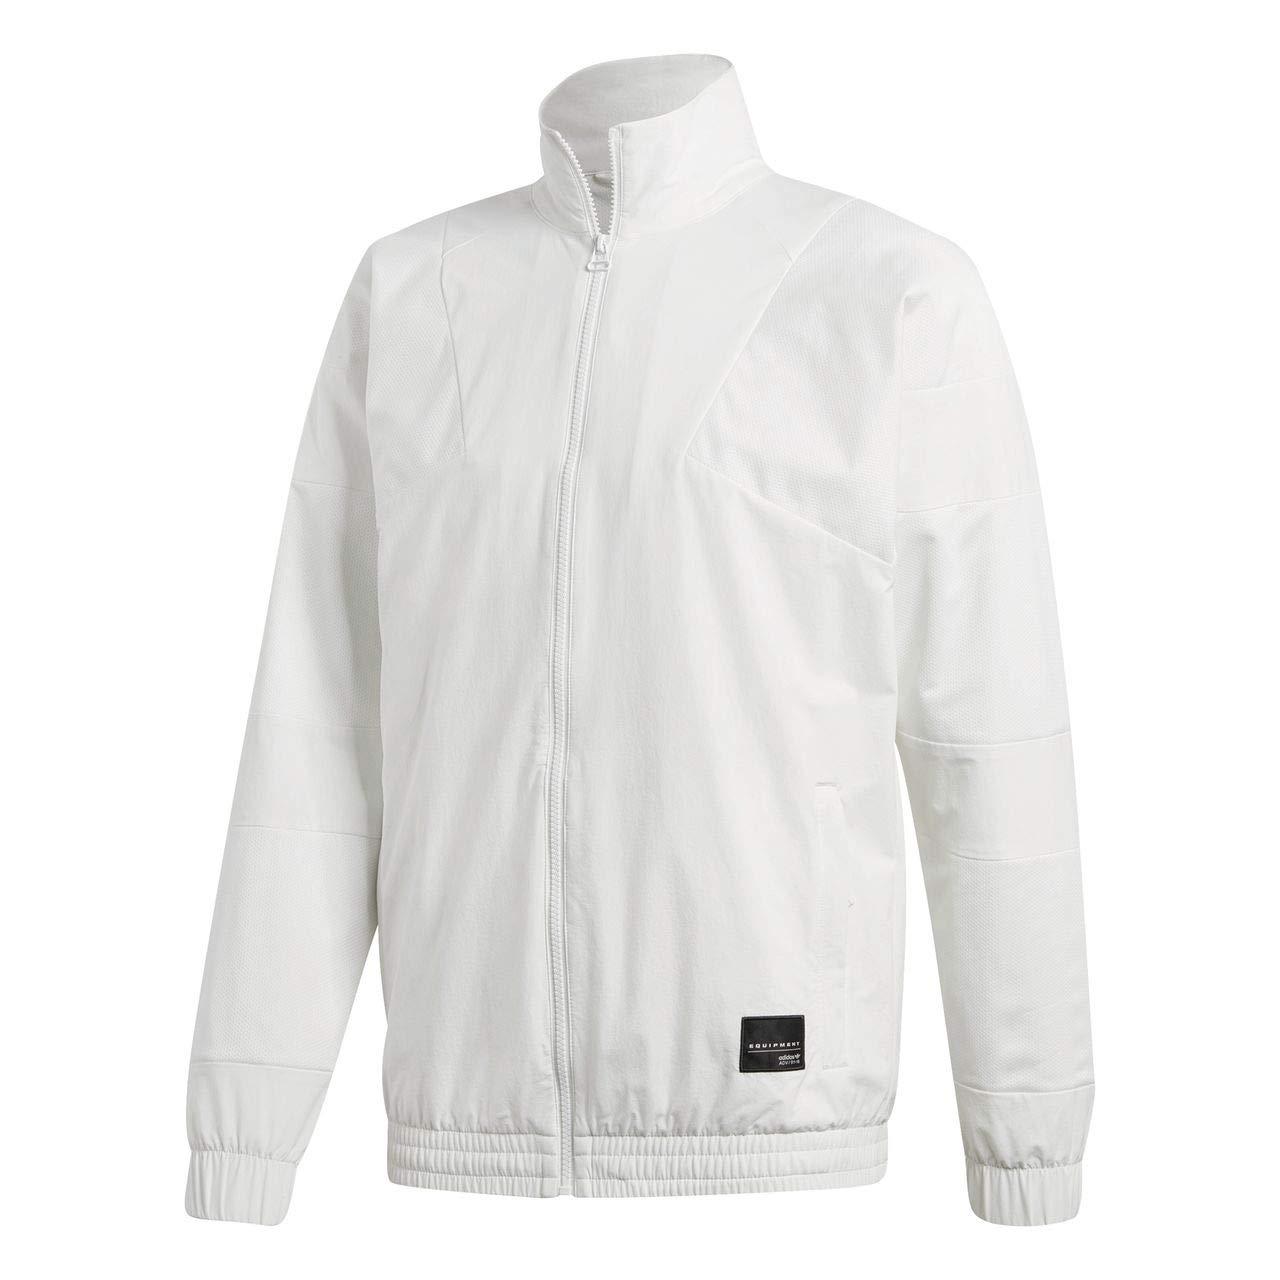 Adidas EQT Bold 2.0 Originals Jacke Herren